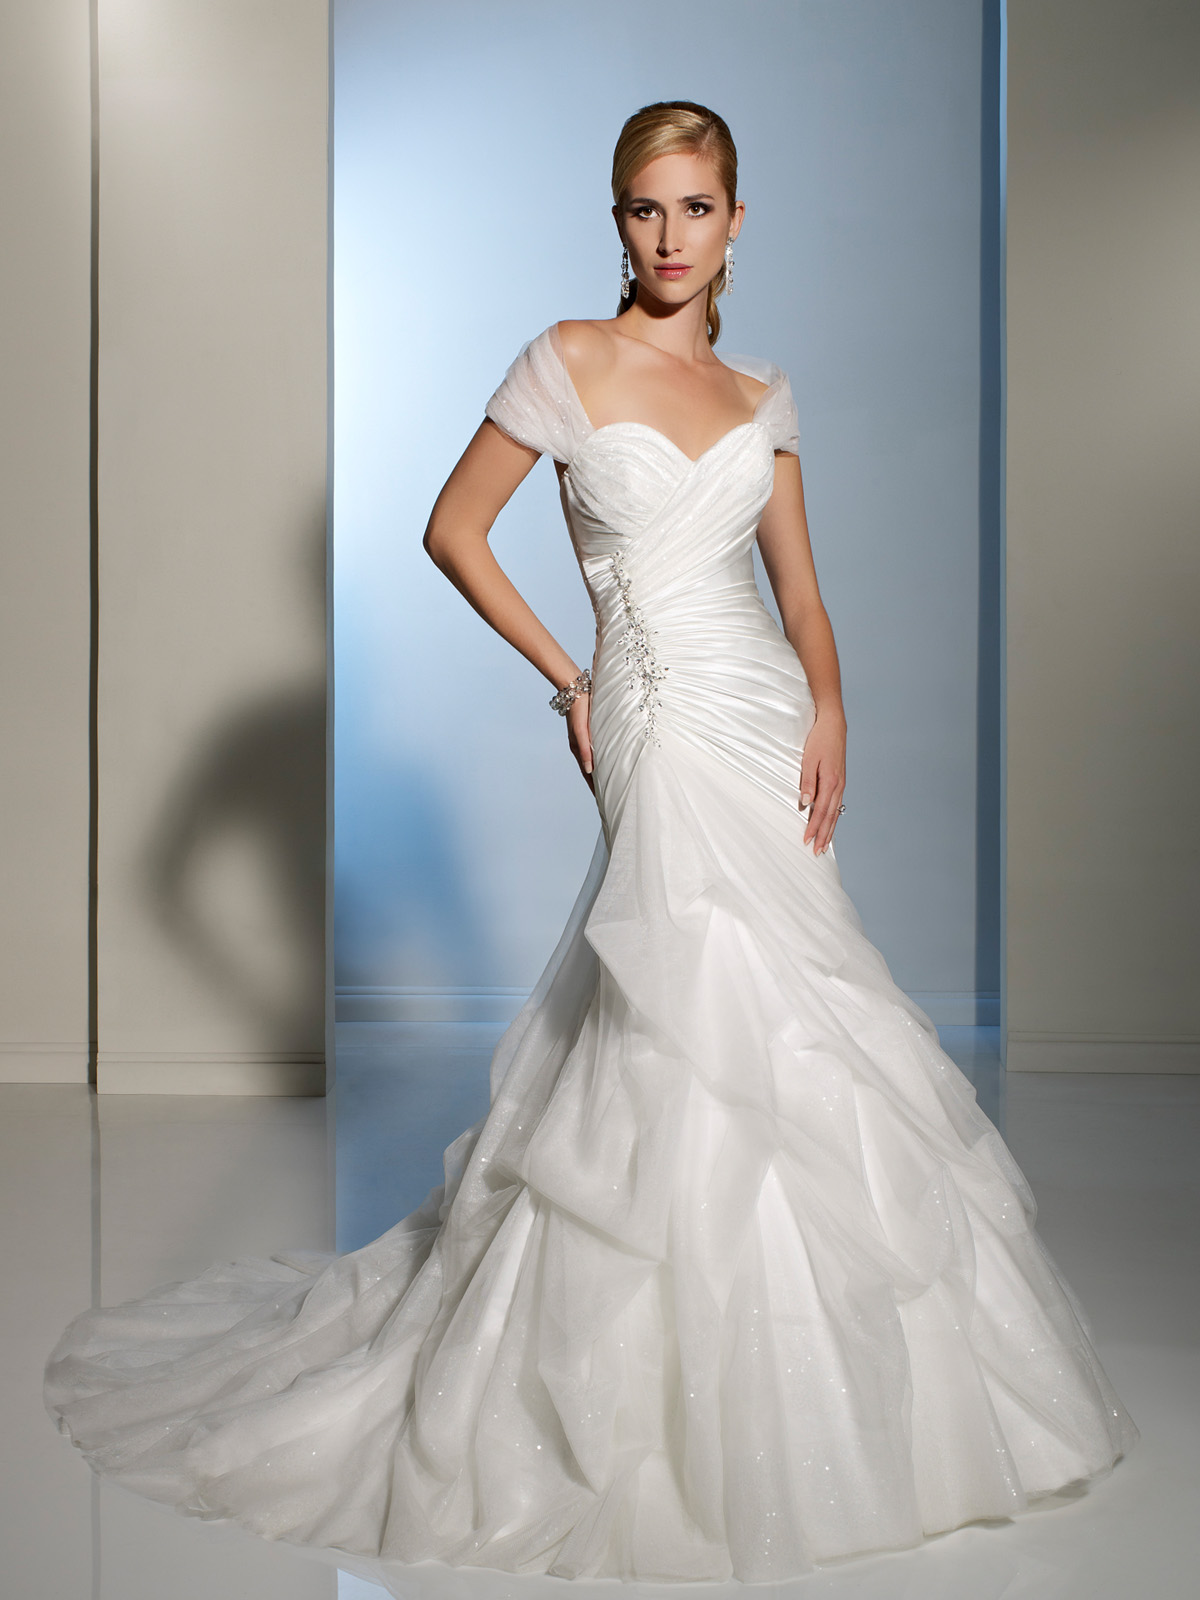 West Weddings: Splendid Sophia: A Designer Wedding Gown Event